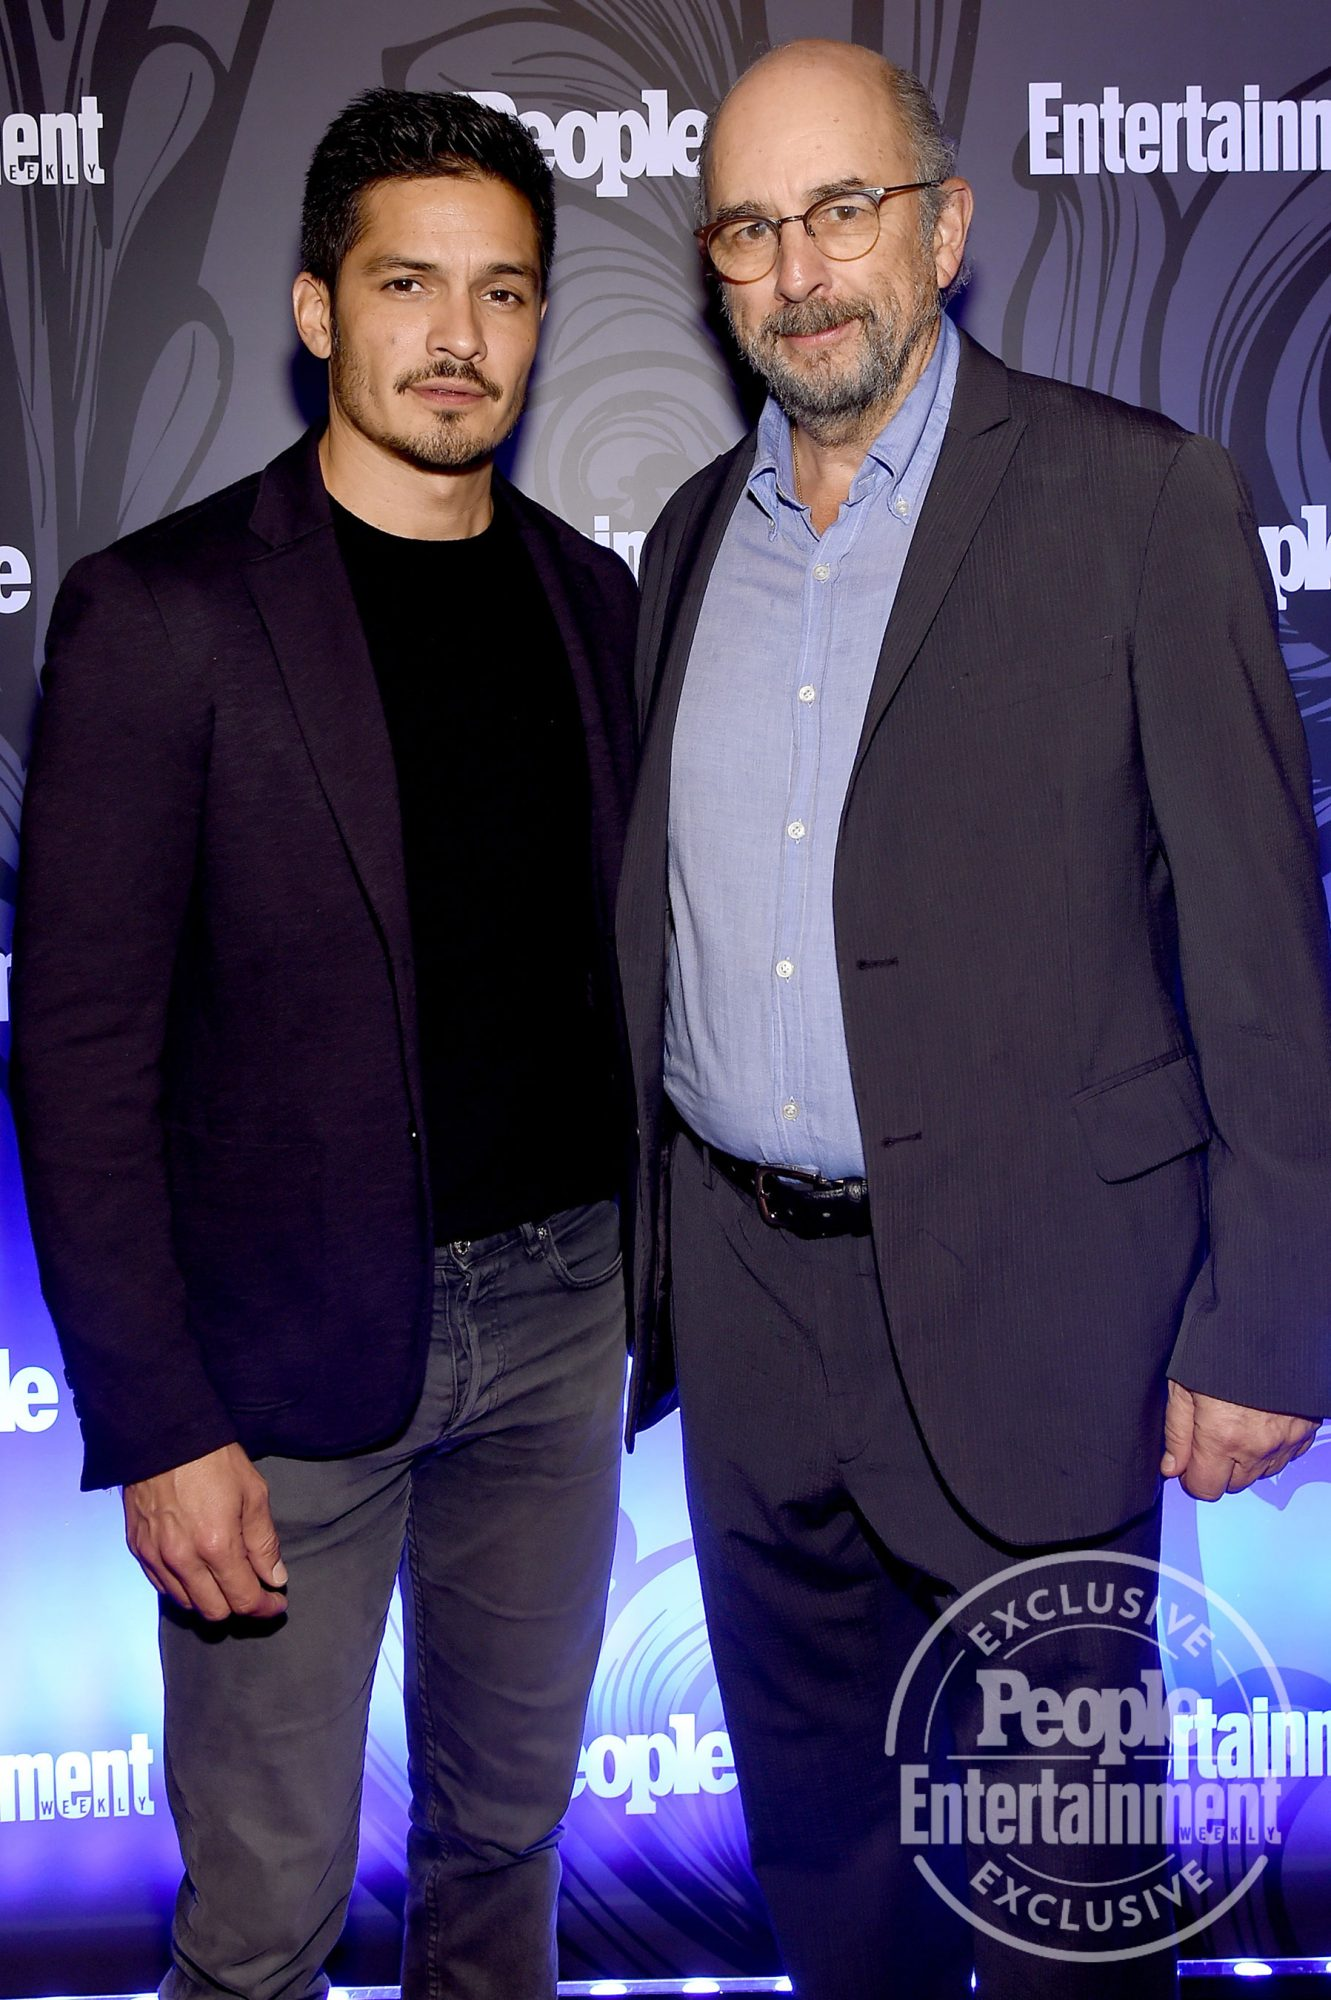 Nicholas Gonzalez and Richard Schiff of The Good Doctor